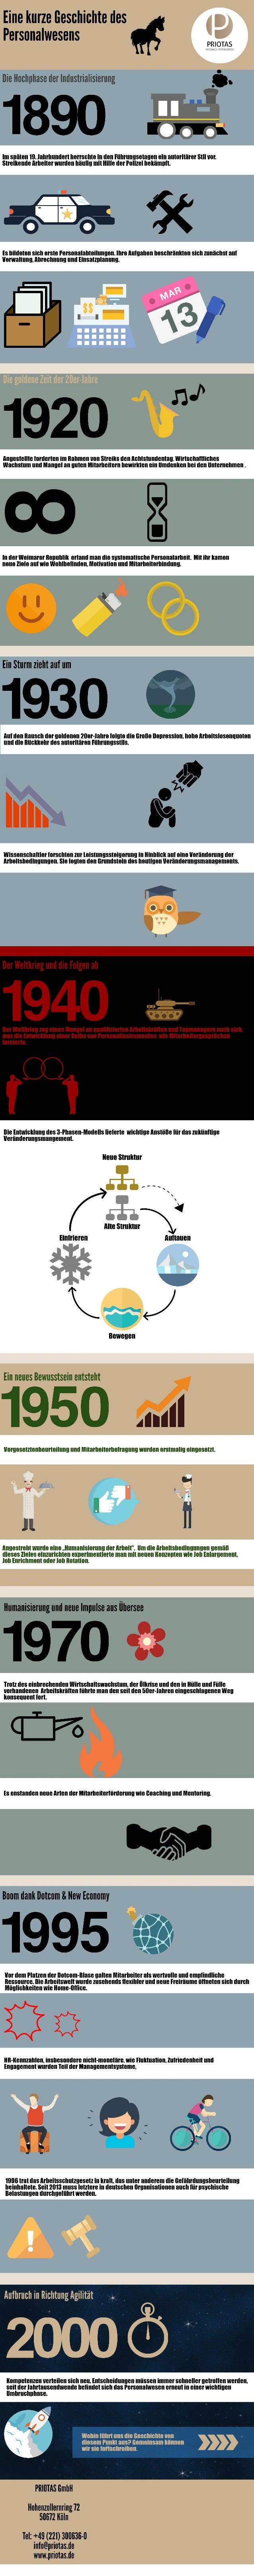 2016-Infografik-Eine kurze Geschichte des Personalwesens